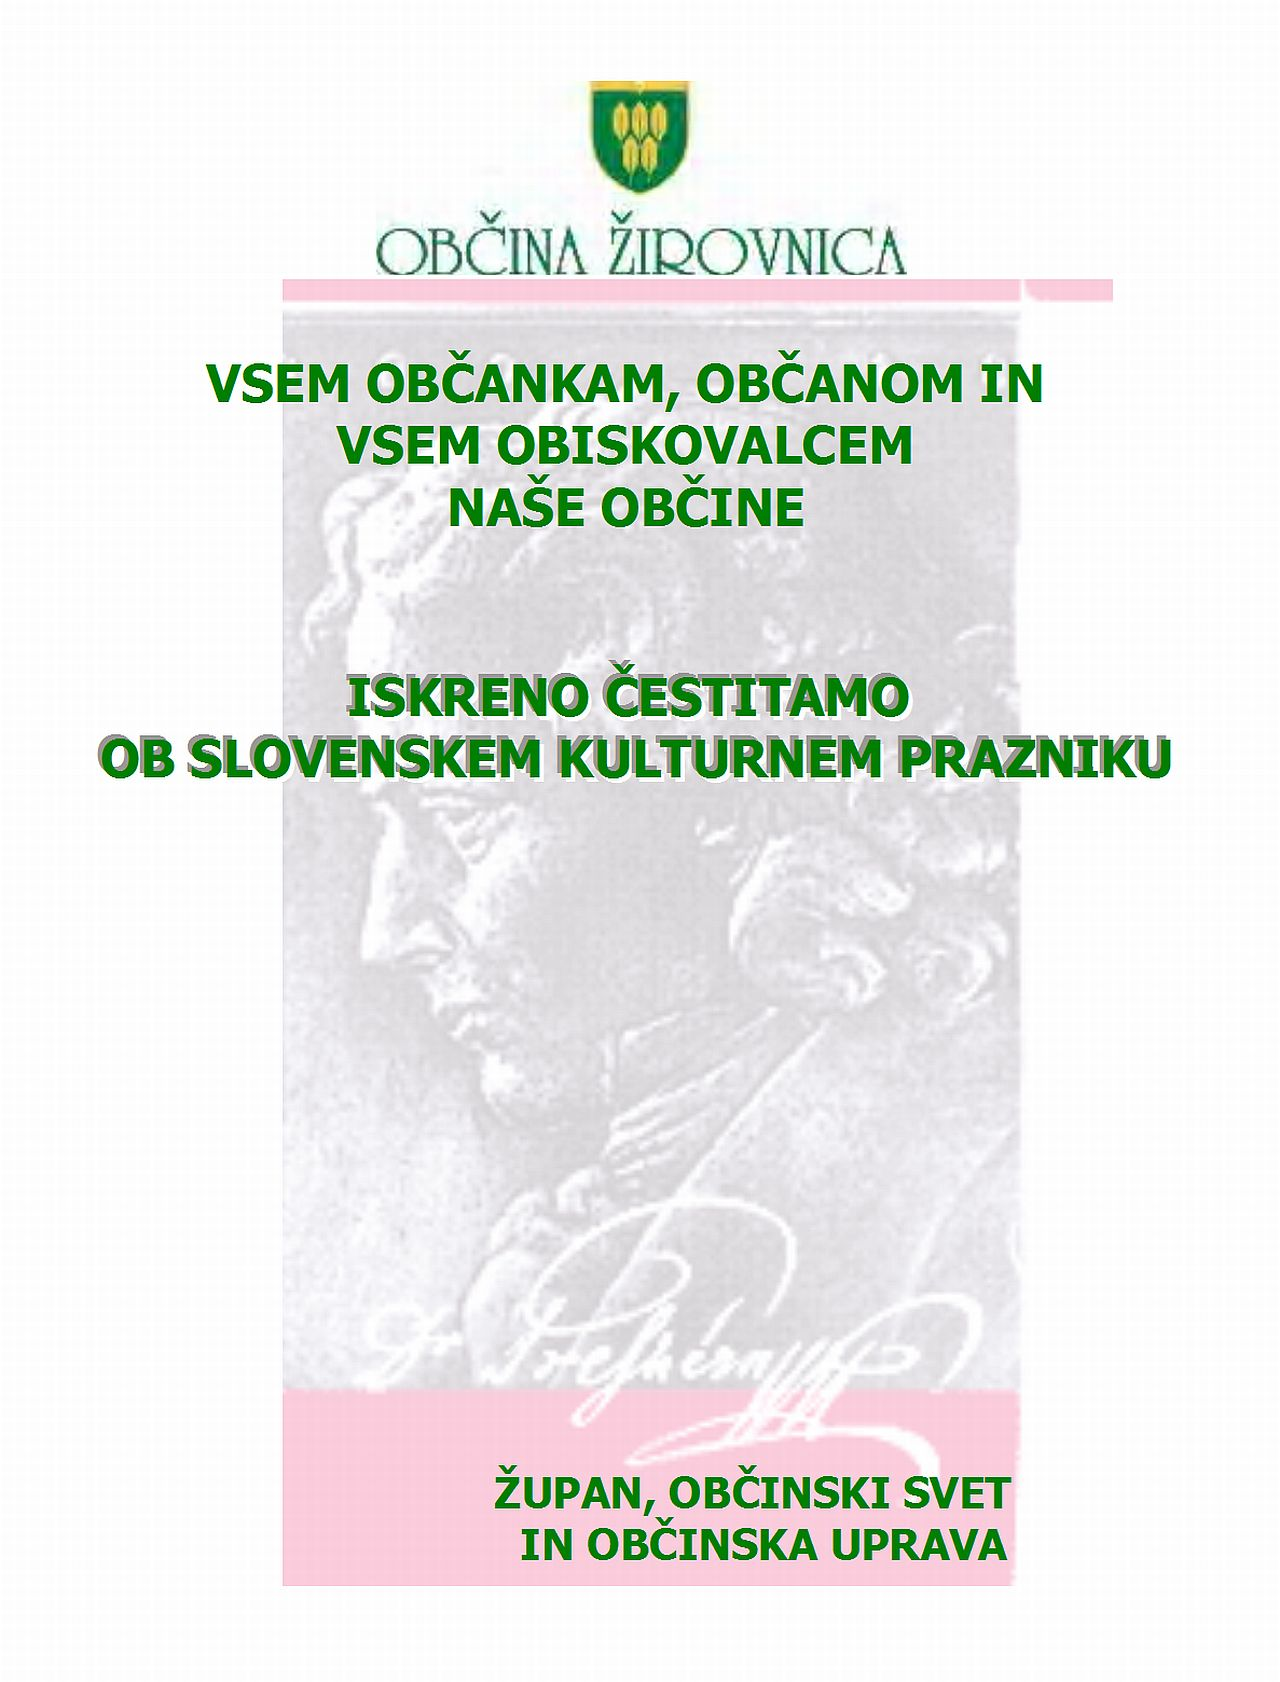 CESTITKA-8 FEBRUAR (2)